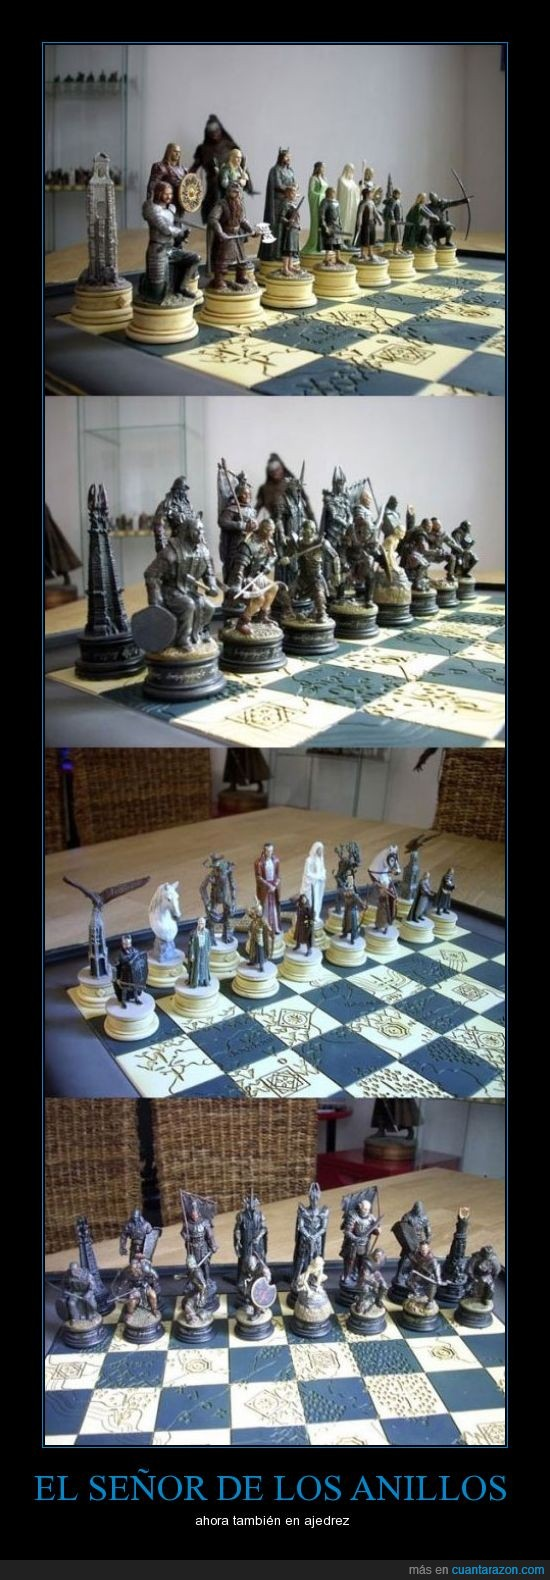 ajedres,ajedrez,gandalf,juego